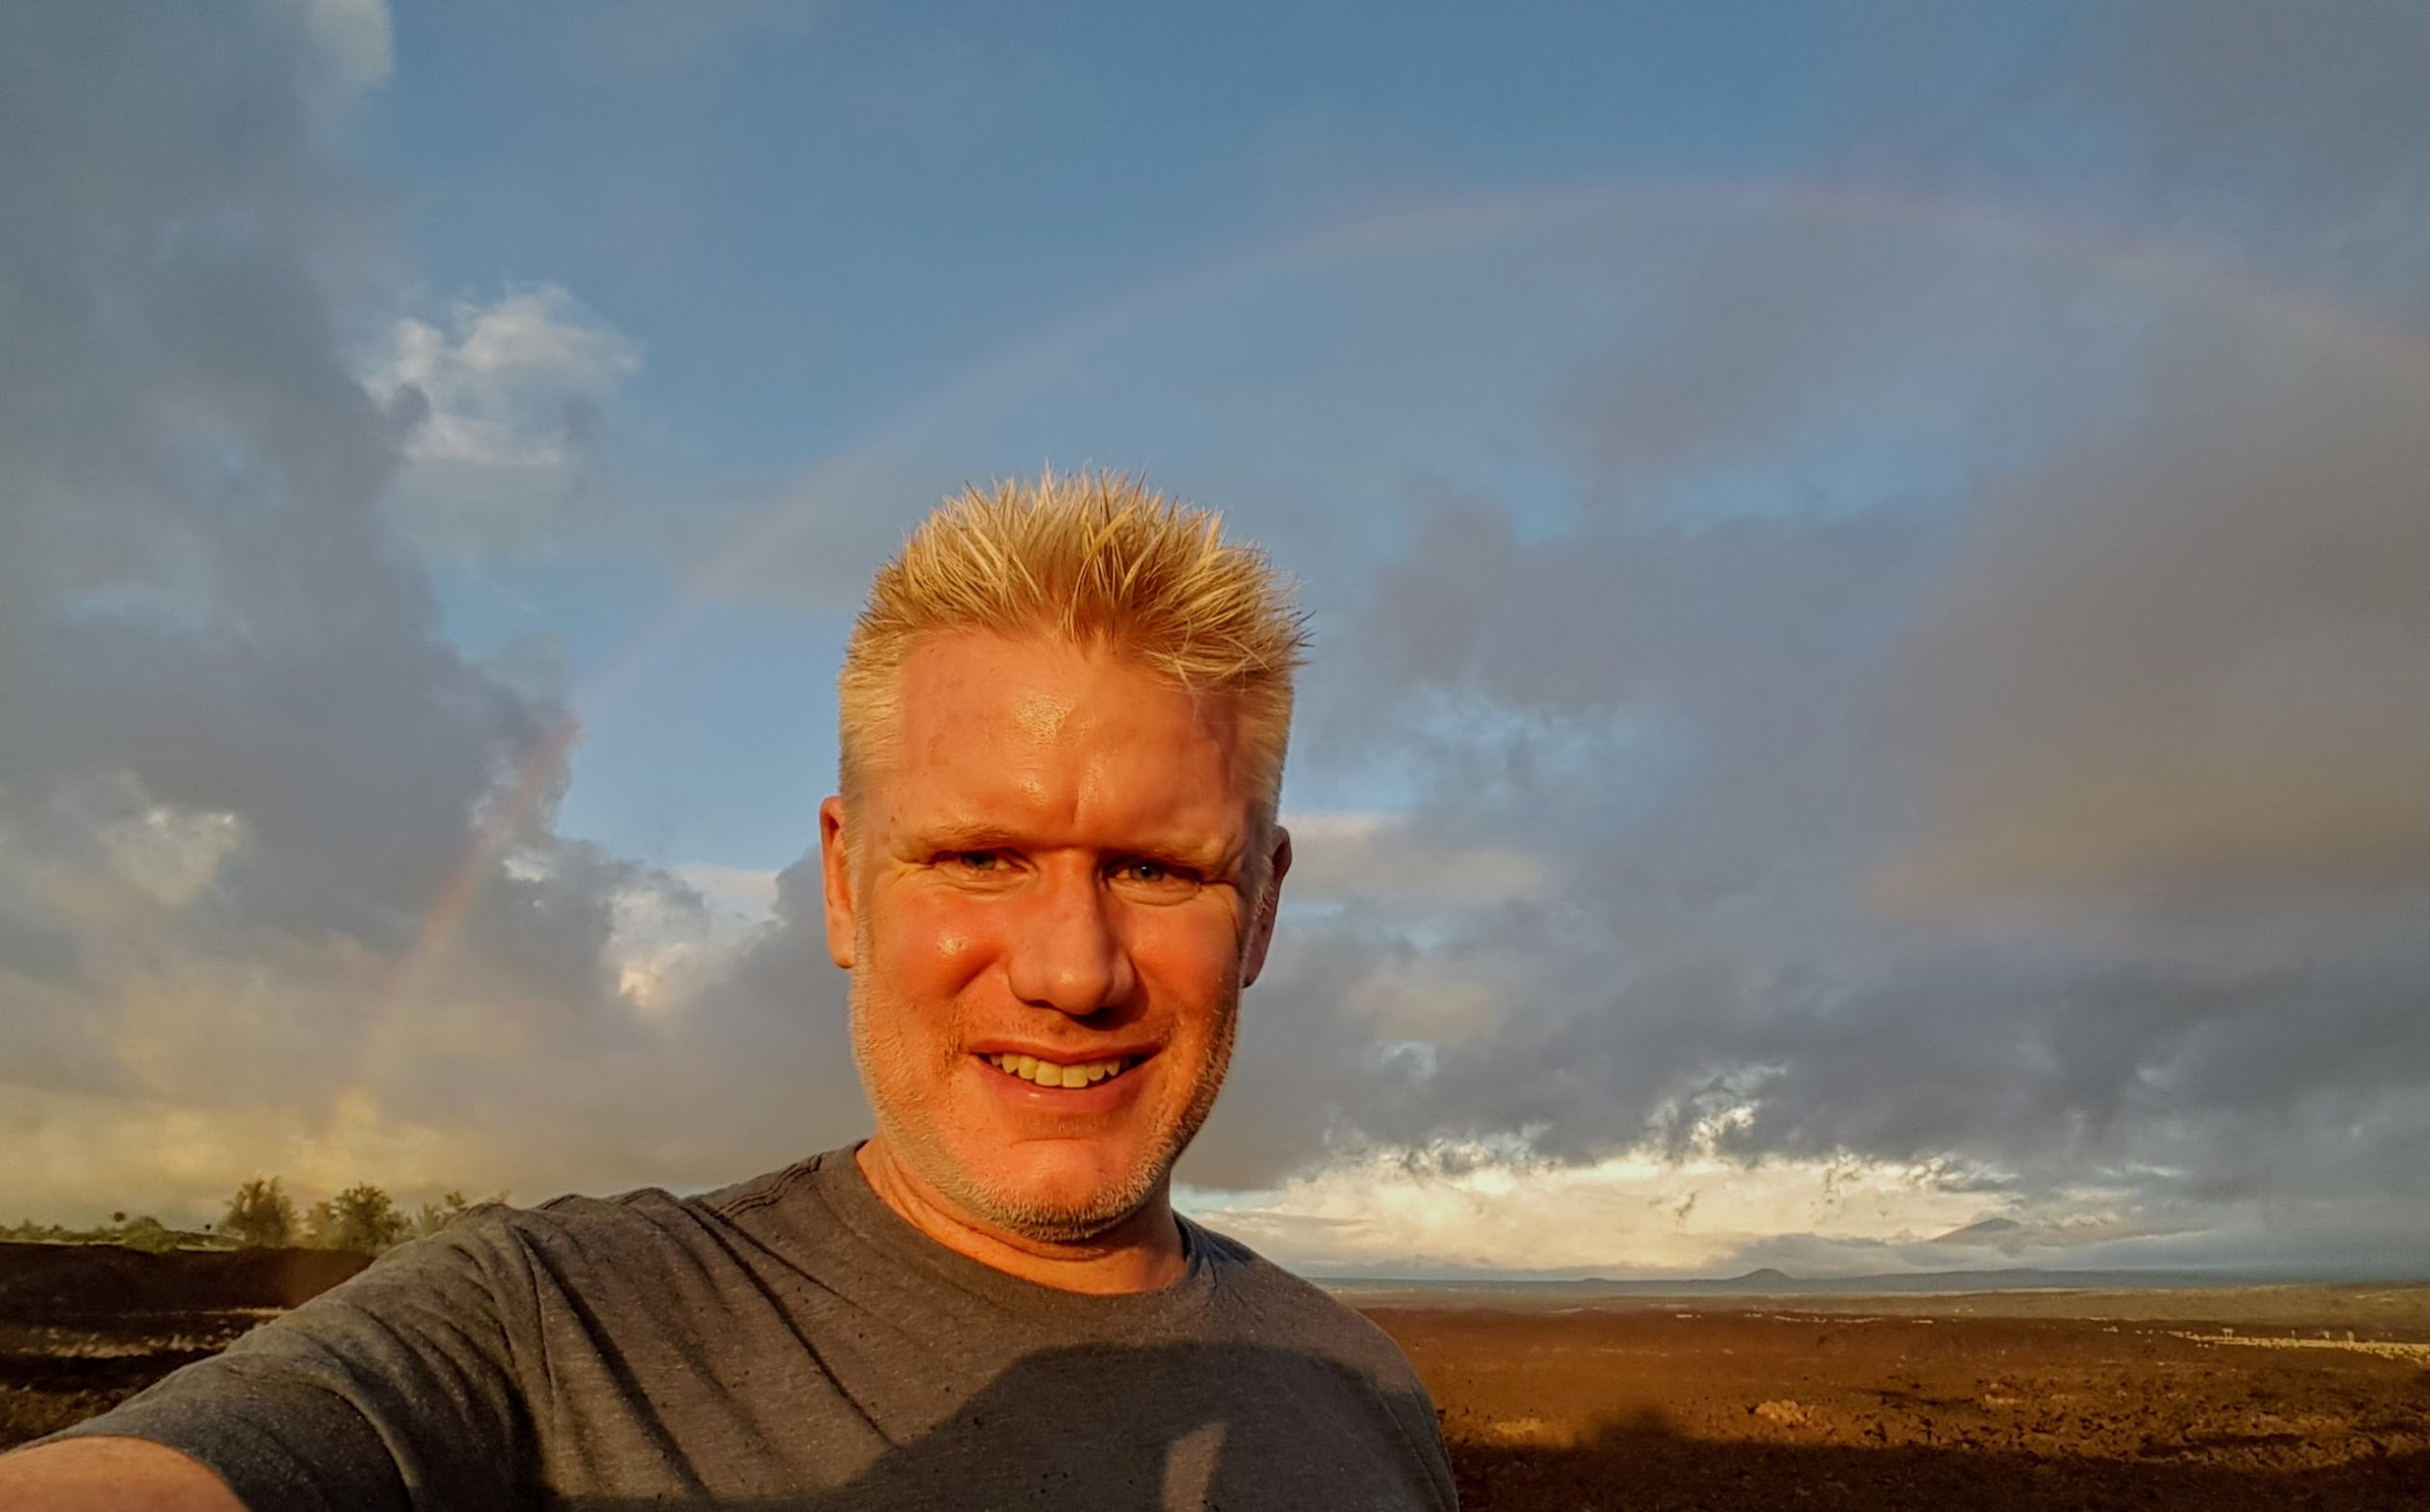 Christian, catching a rainbow on the Big Island of Hawaii (Kona)